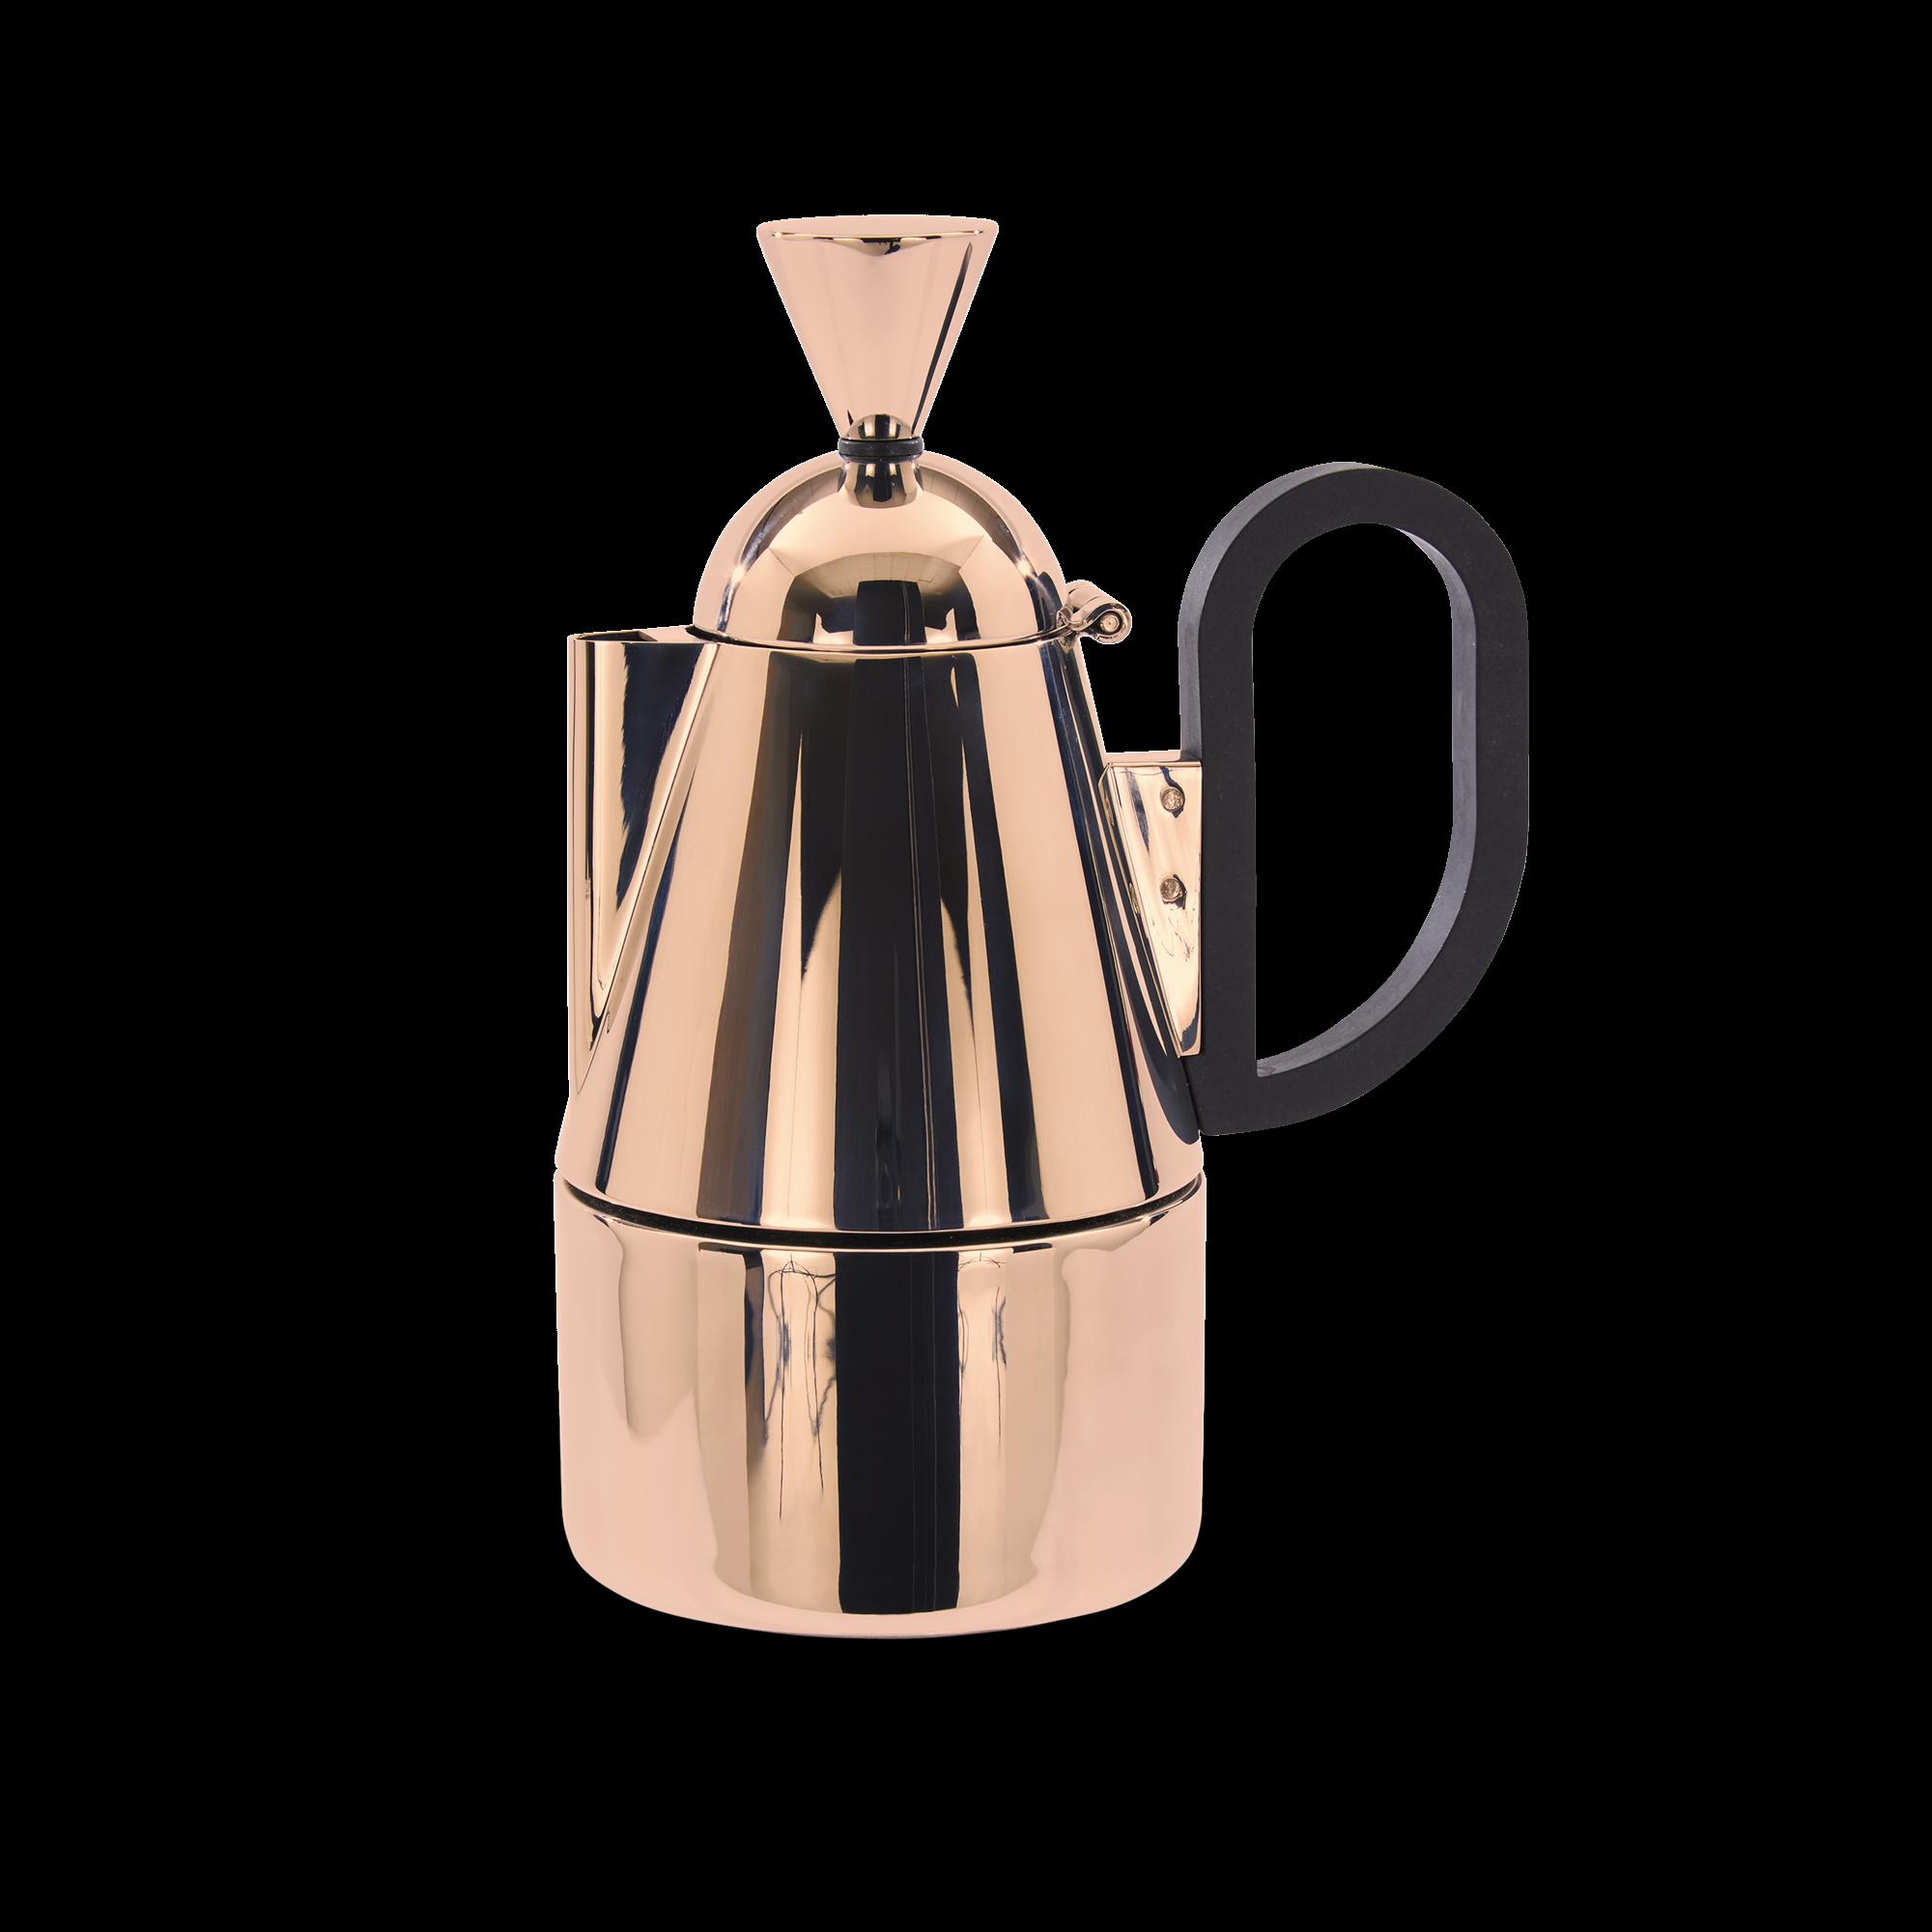 brew-stove-top-coffee-maker-1